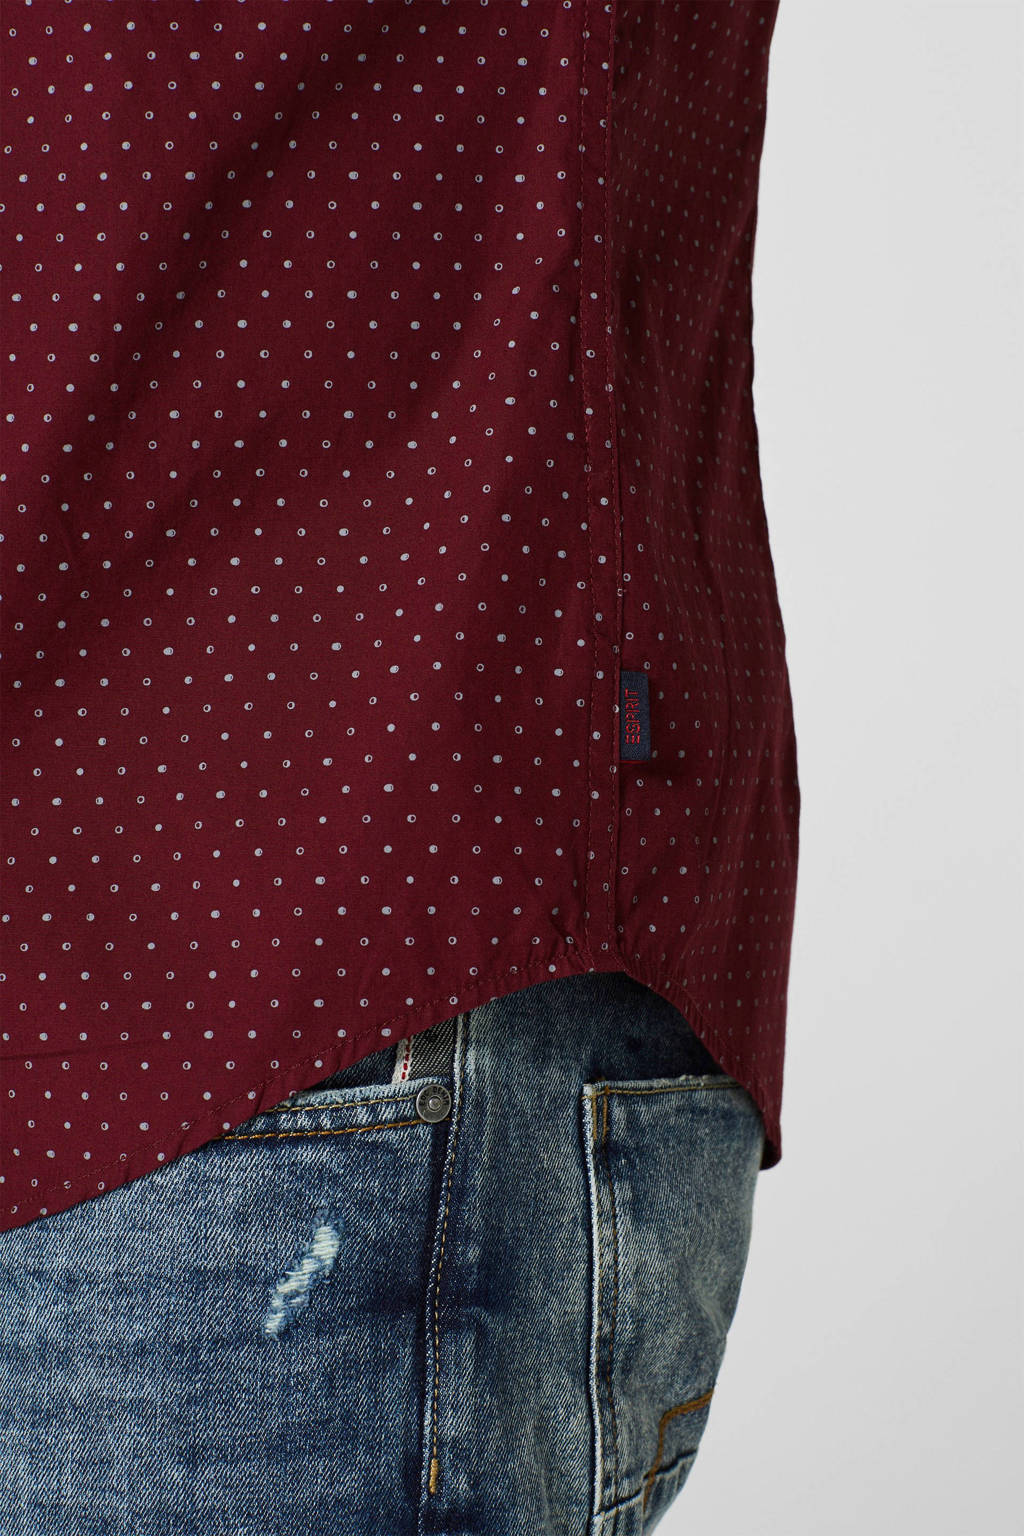 ESPRIT Men Casual slim fit overhemd met stippen donkerrood, Donkerrood